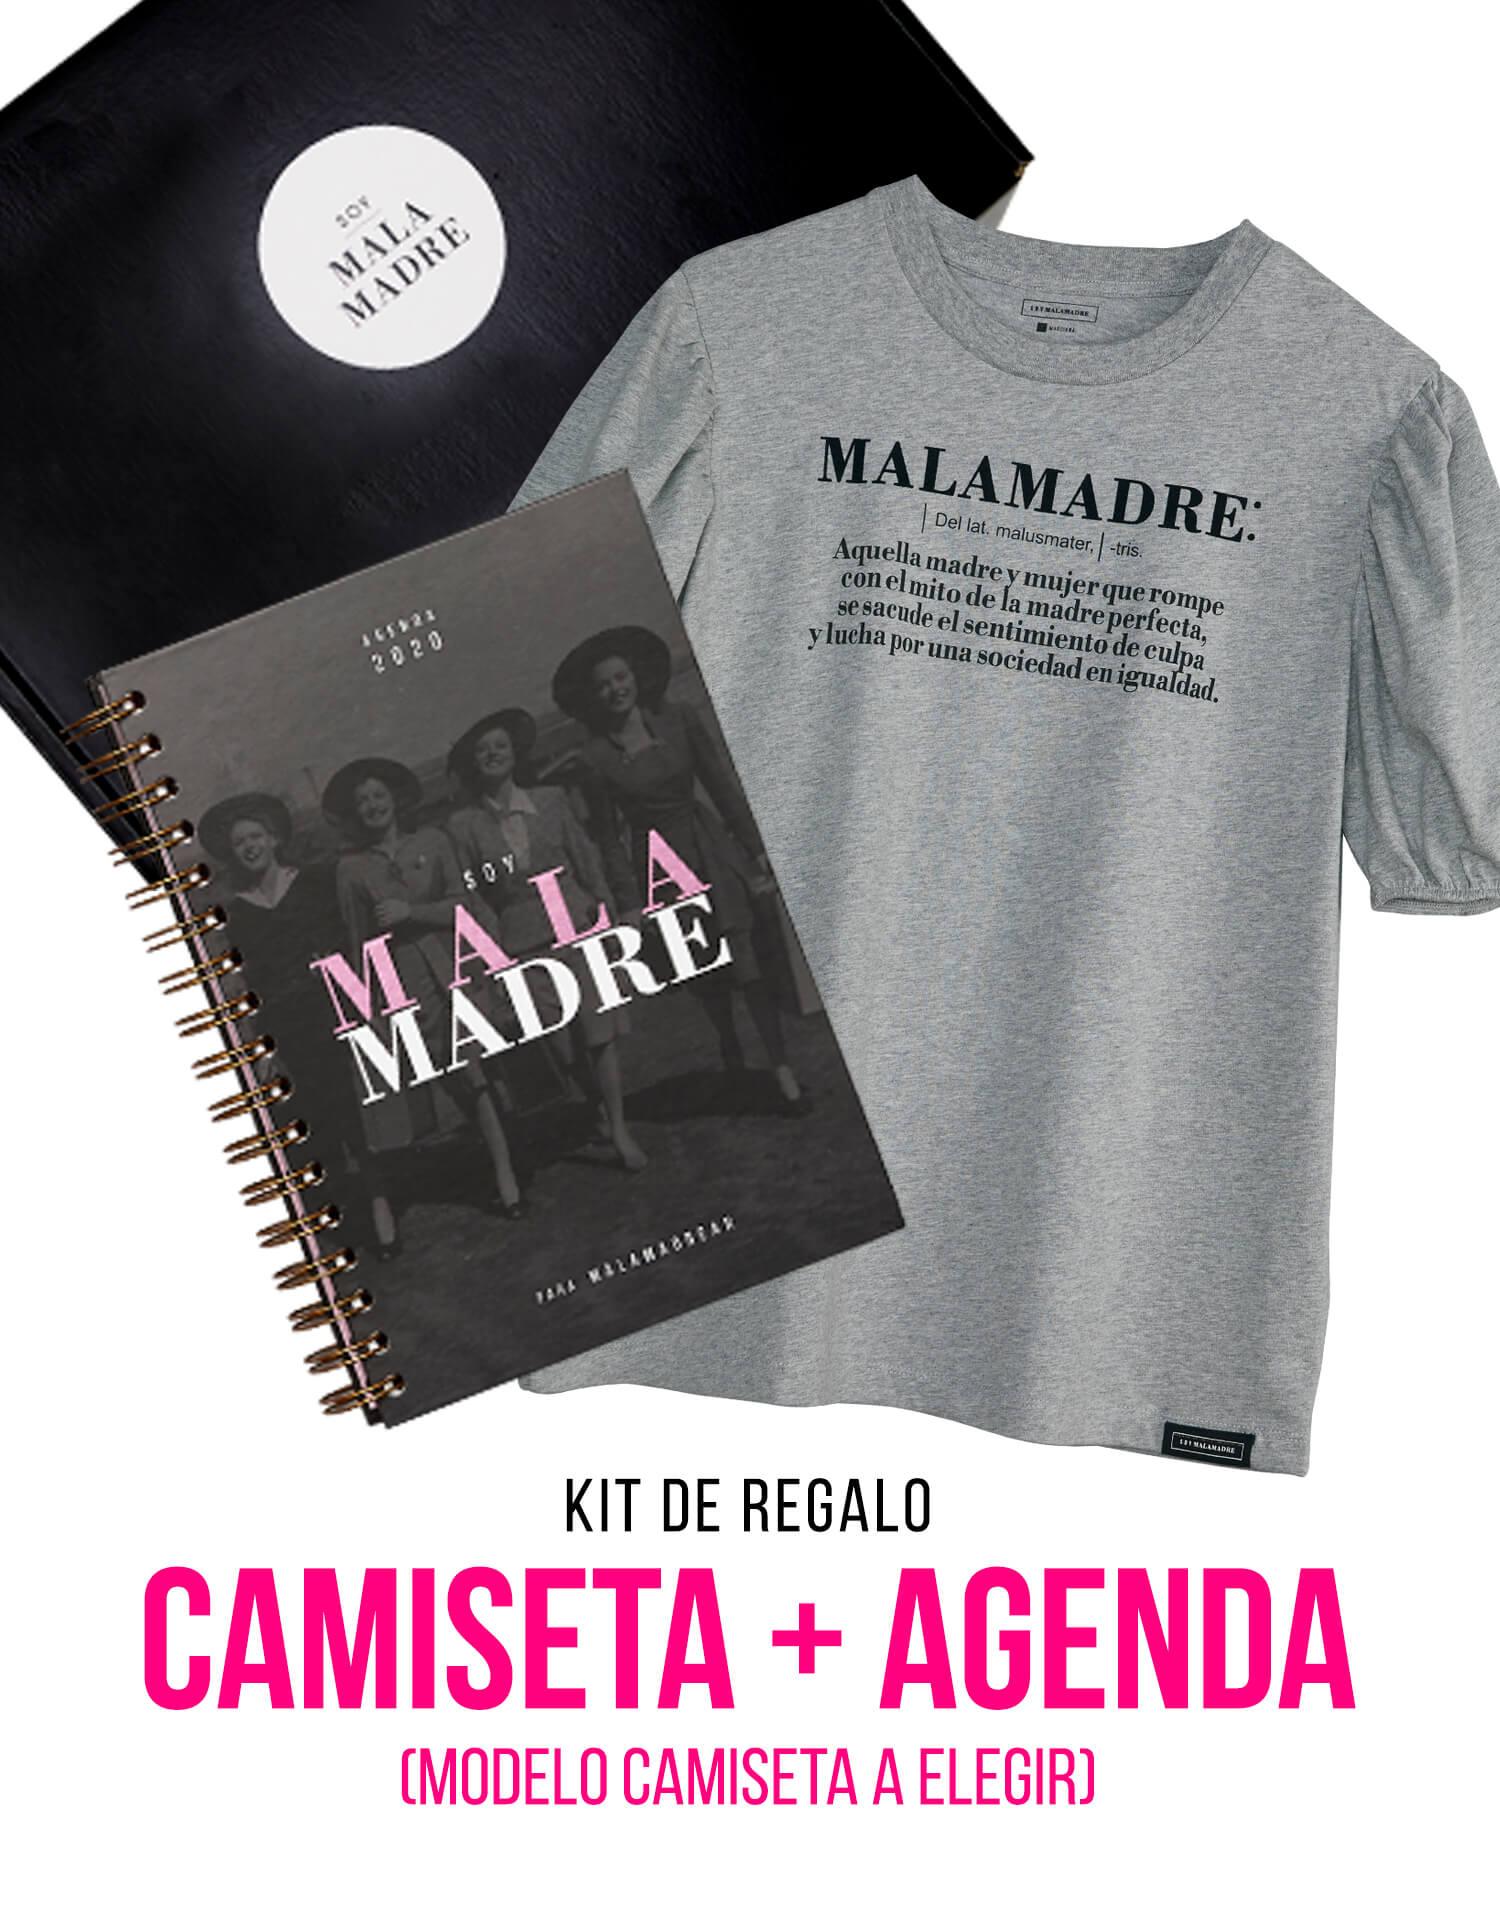 Kit Agenda 2020 con camiseta